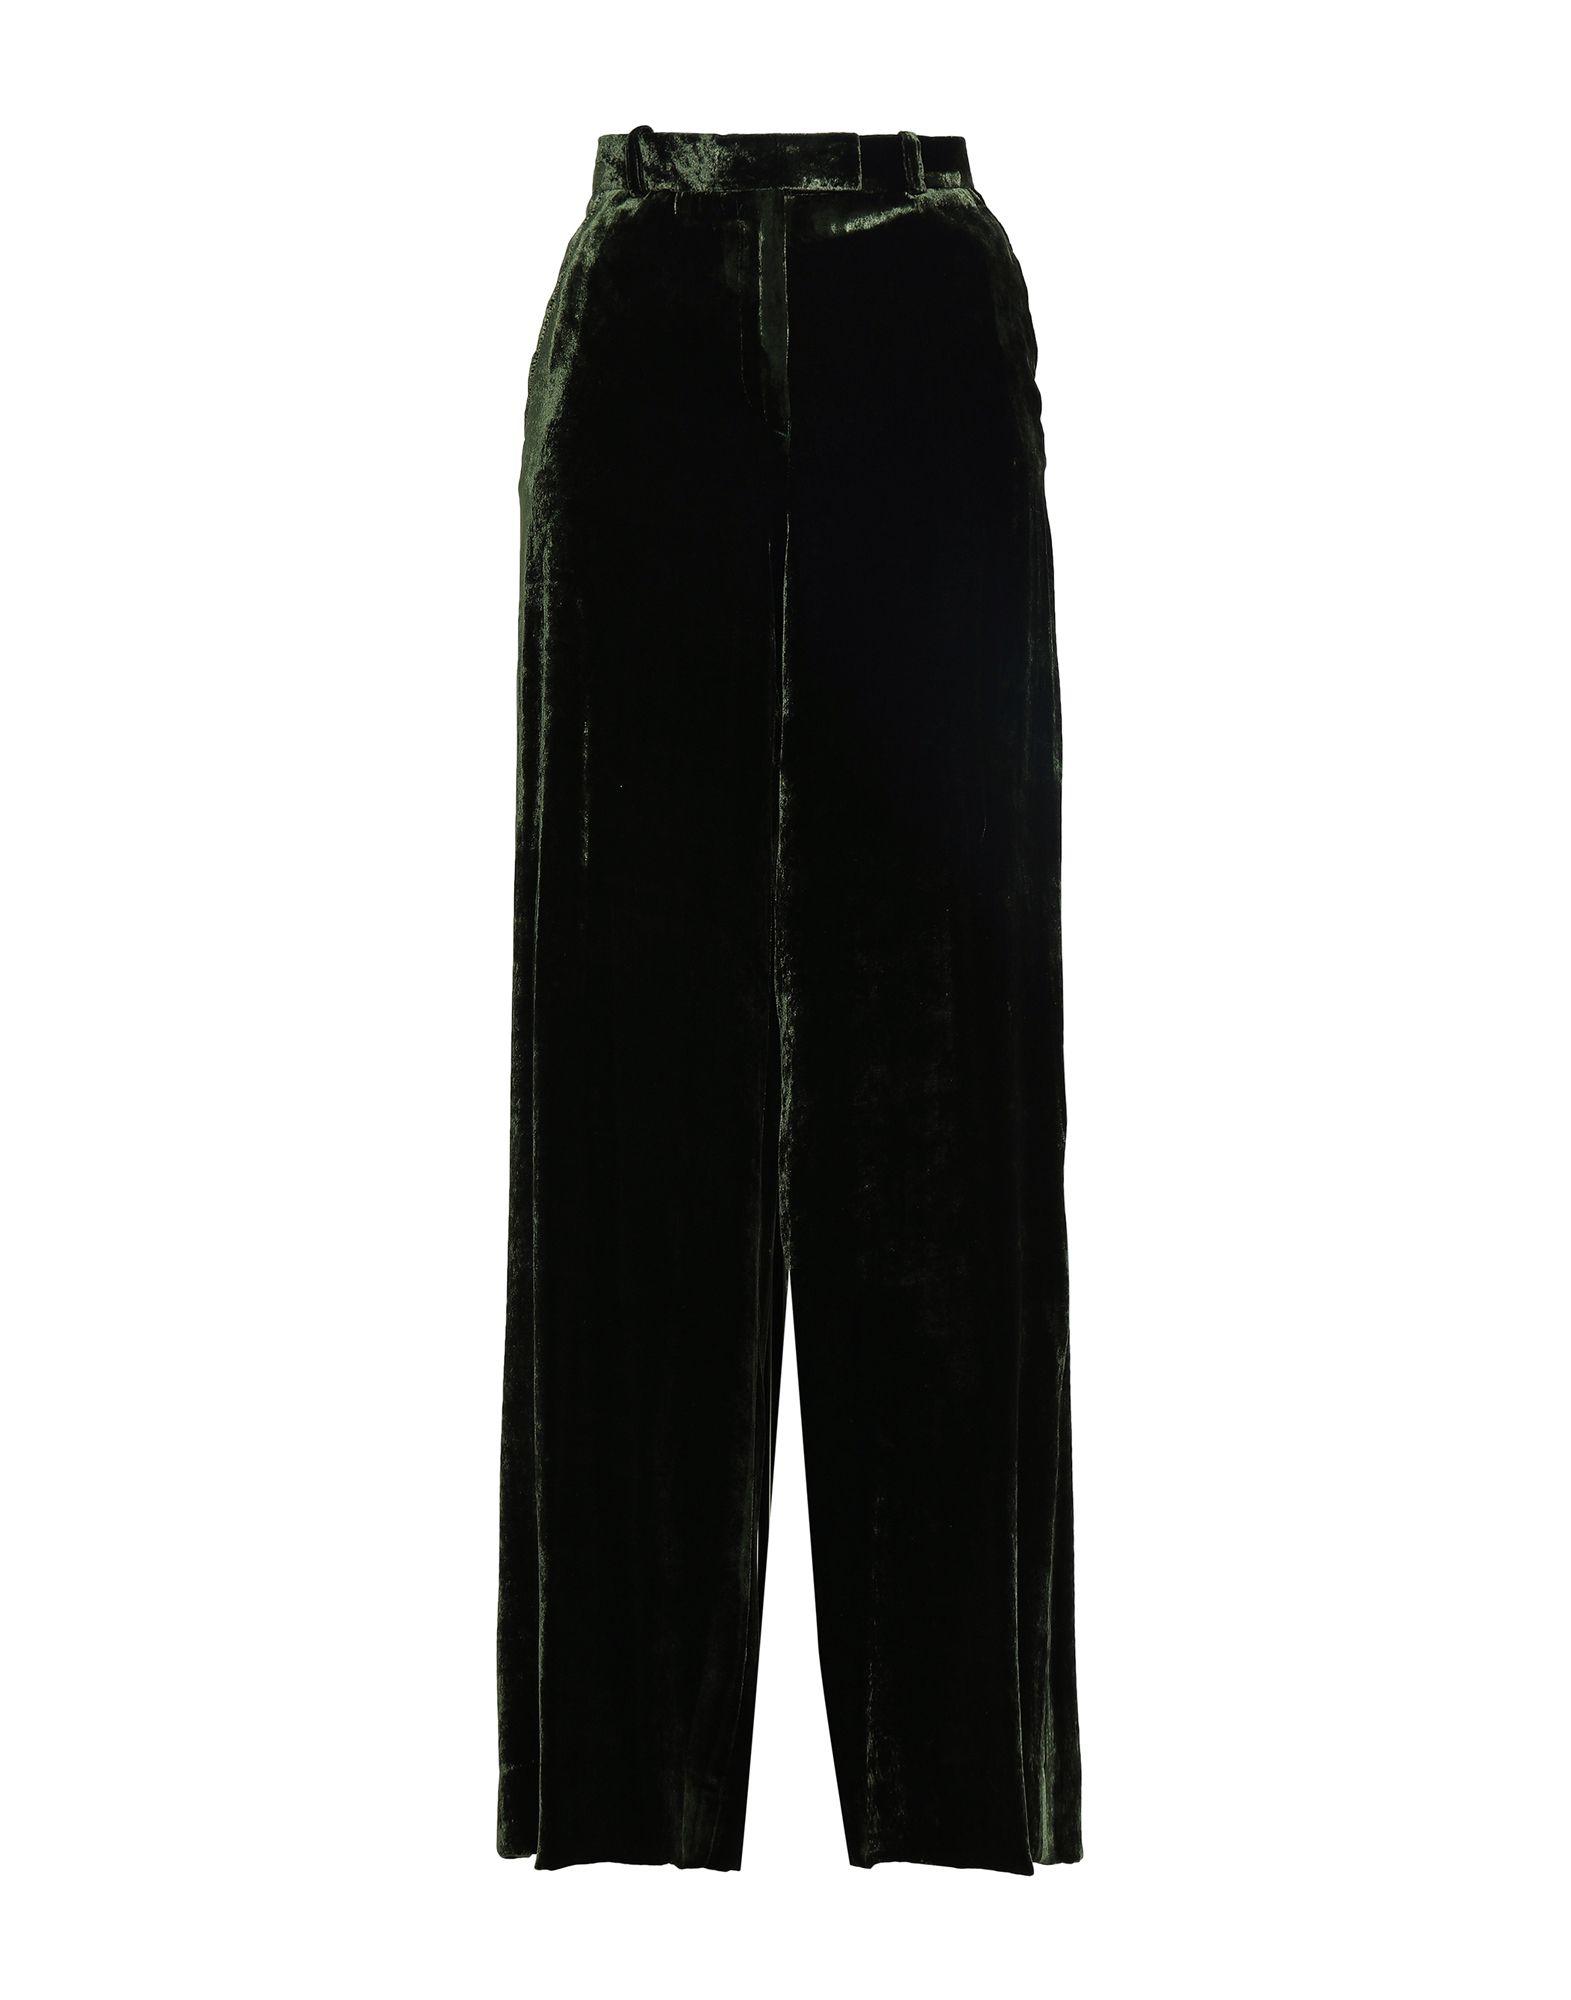 EACH X OTHER Повседневные брюки adidas x yeezy повседневные брюки